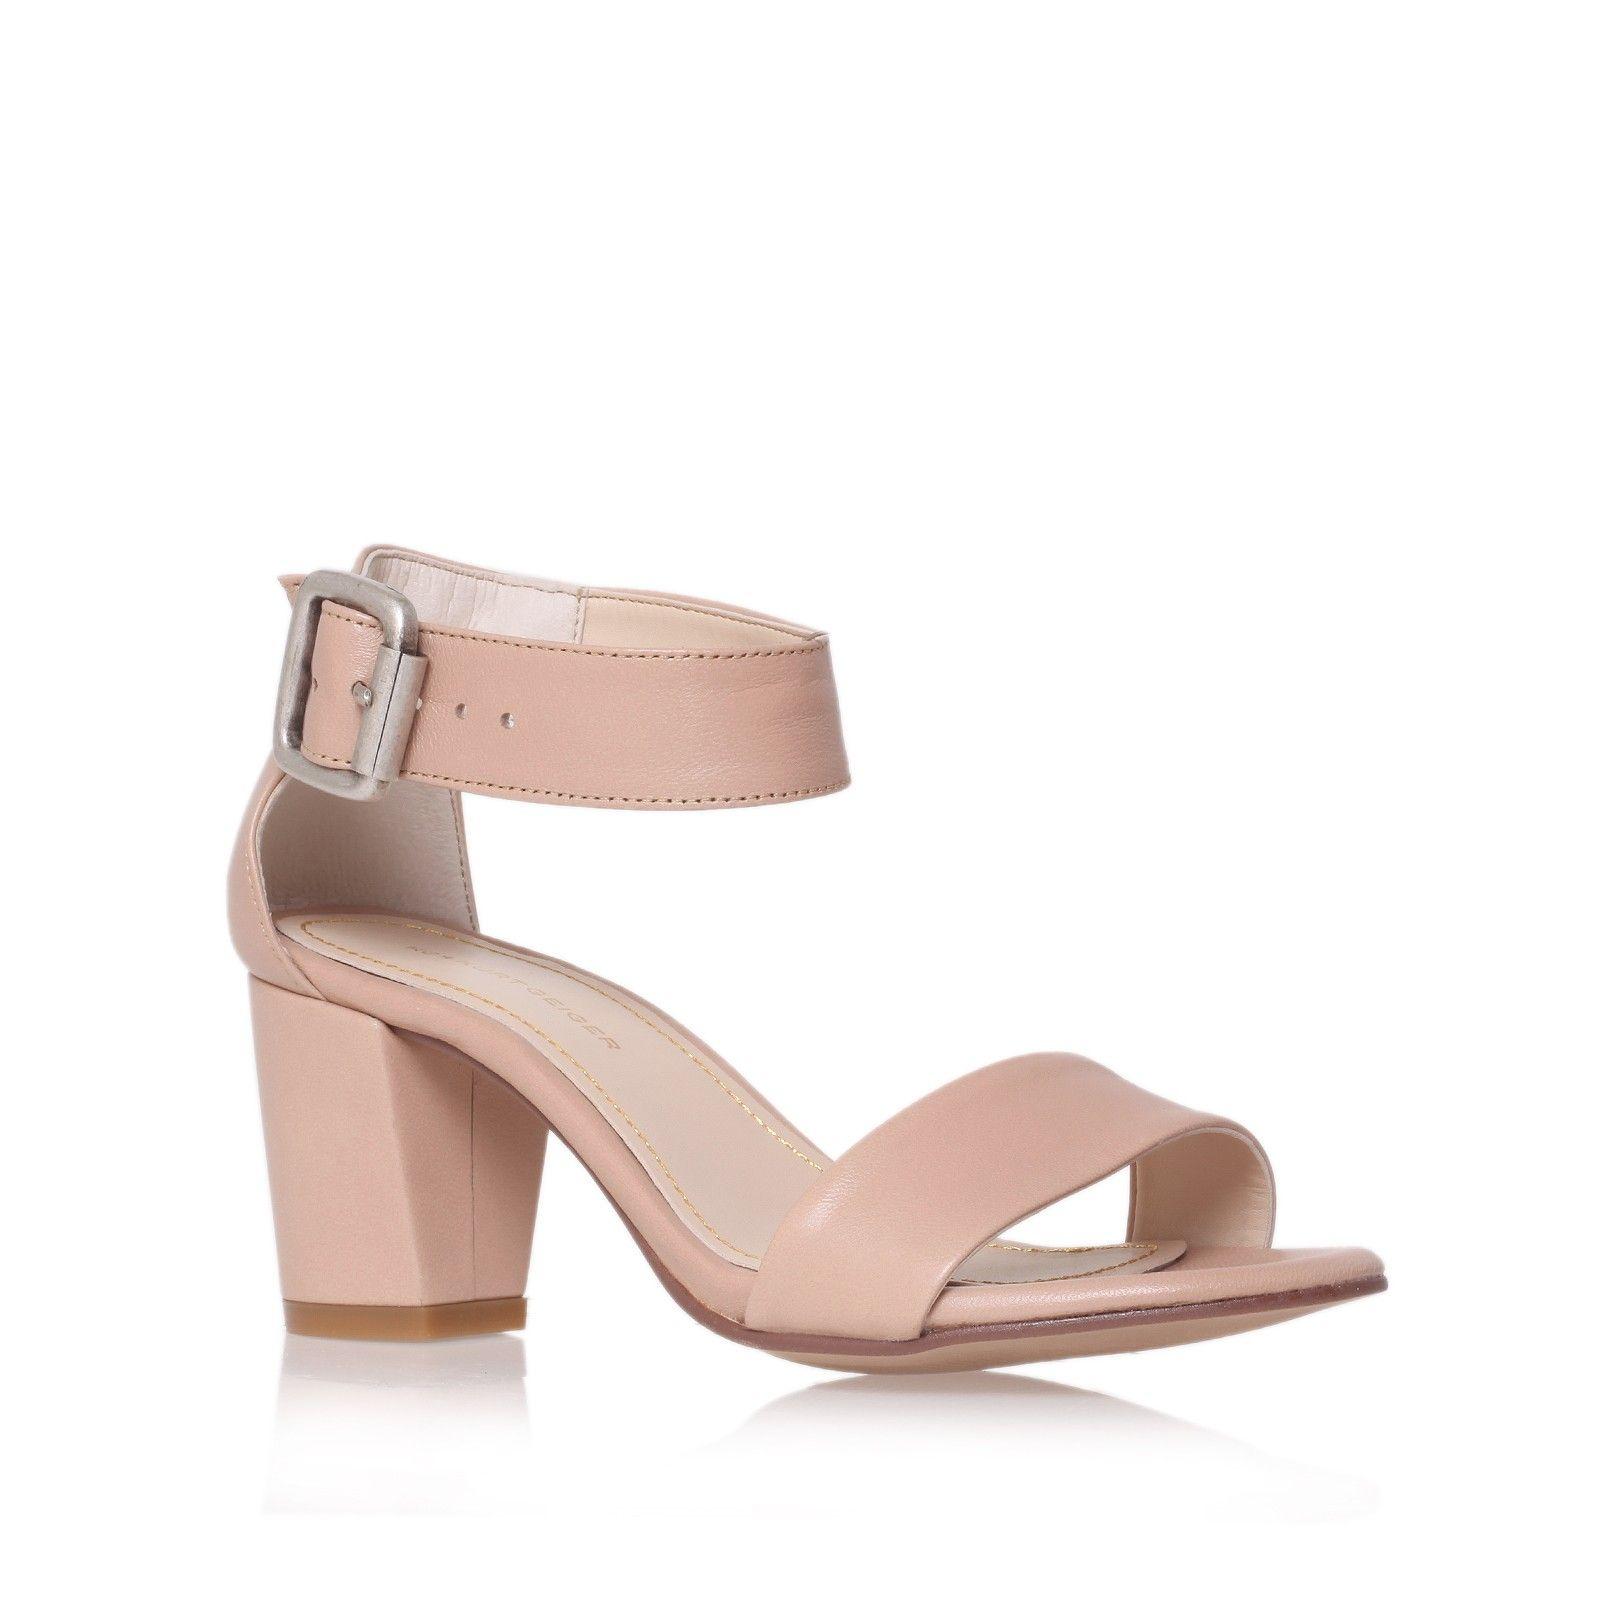 d1e40b64220 Nude Sophie Mid heel shoes. nina